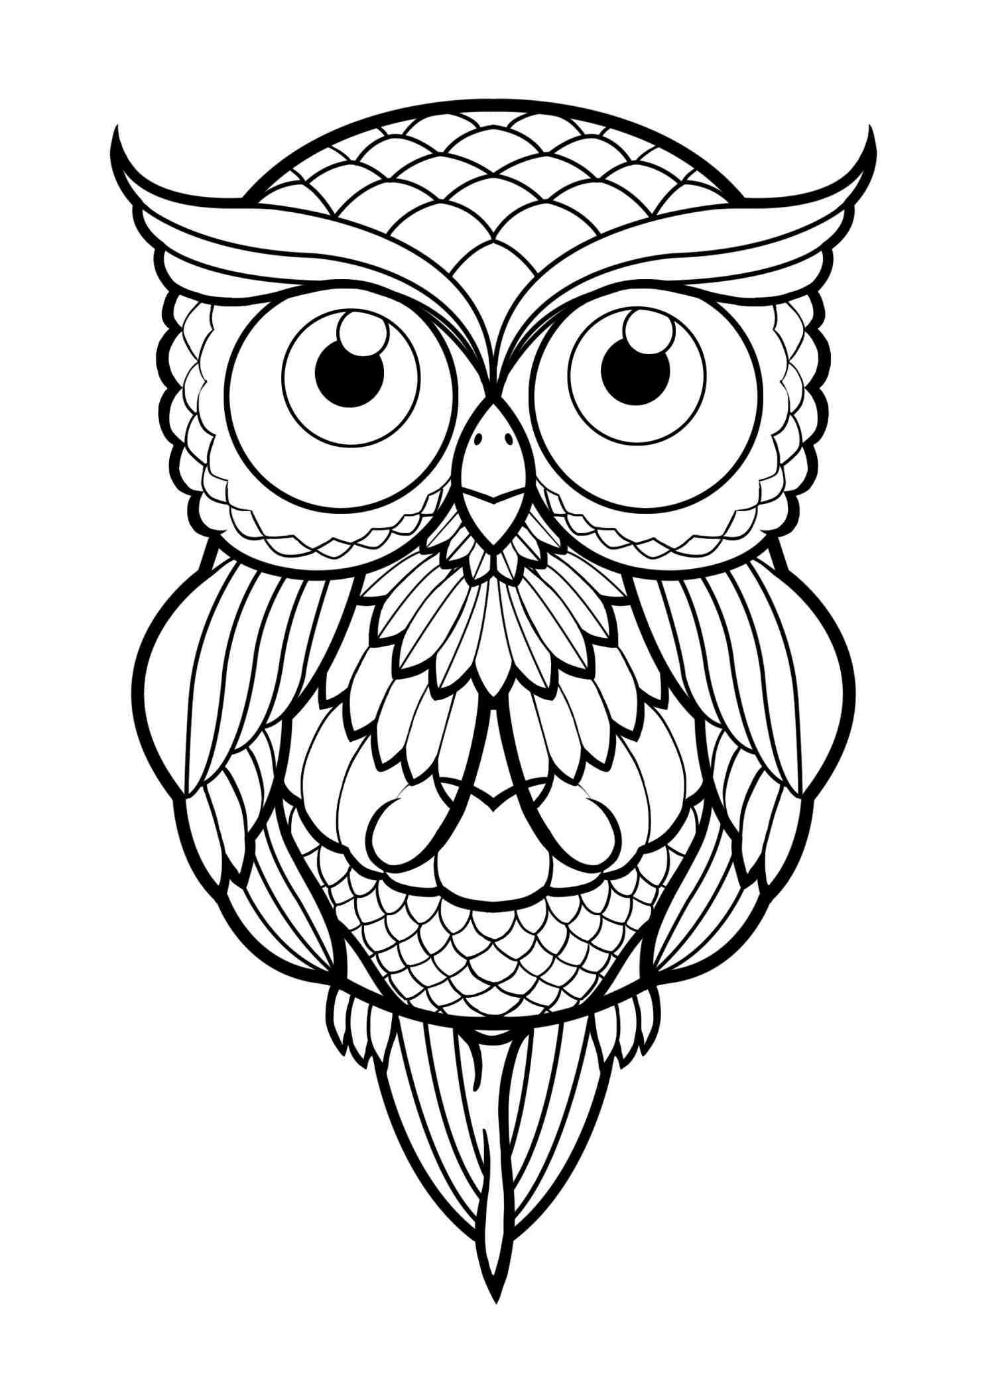 pattern ideas guide patterns free simple owl drawings